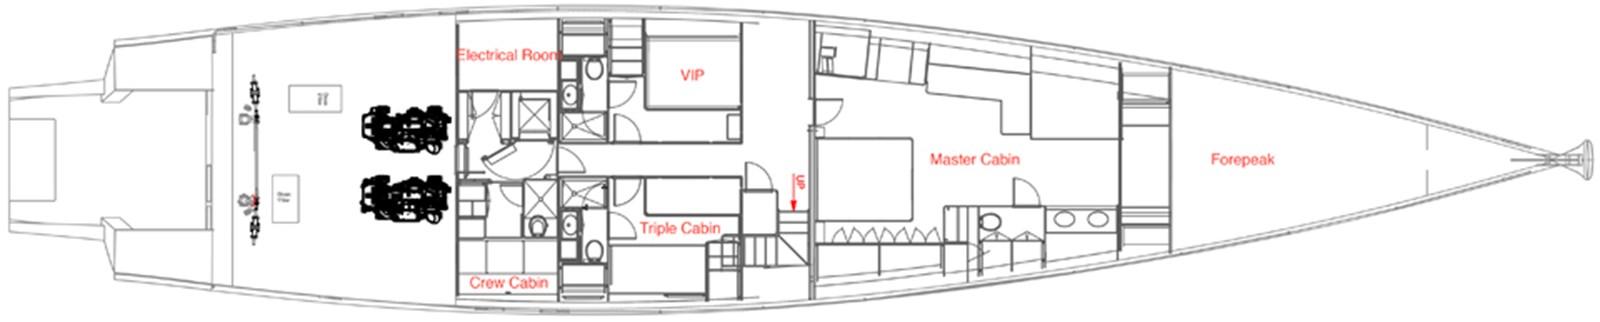 fpb-97-layout-2 2014 CIRCA MARINE FPB 97 Motor Yacht 2788454